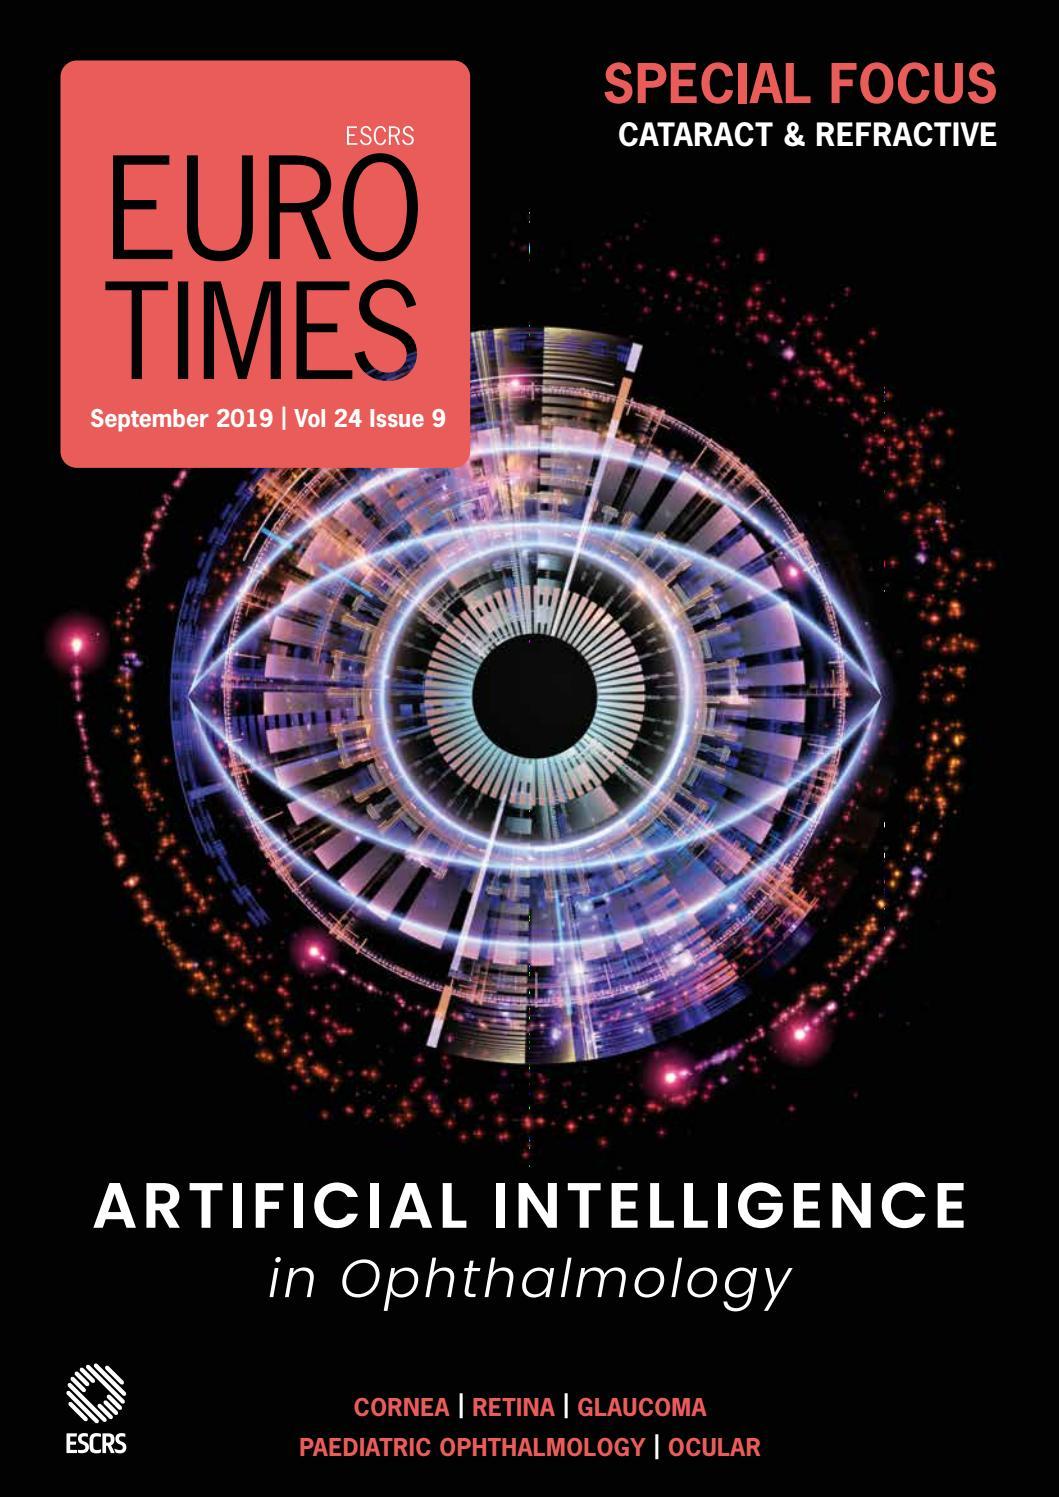 EuroTimes Sept 2019 | Vol 24 Issue 9 by EUROTIMES - issuu